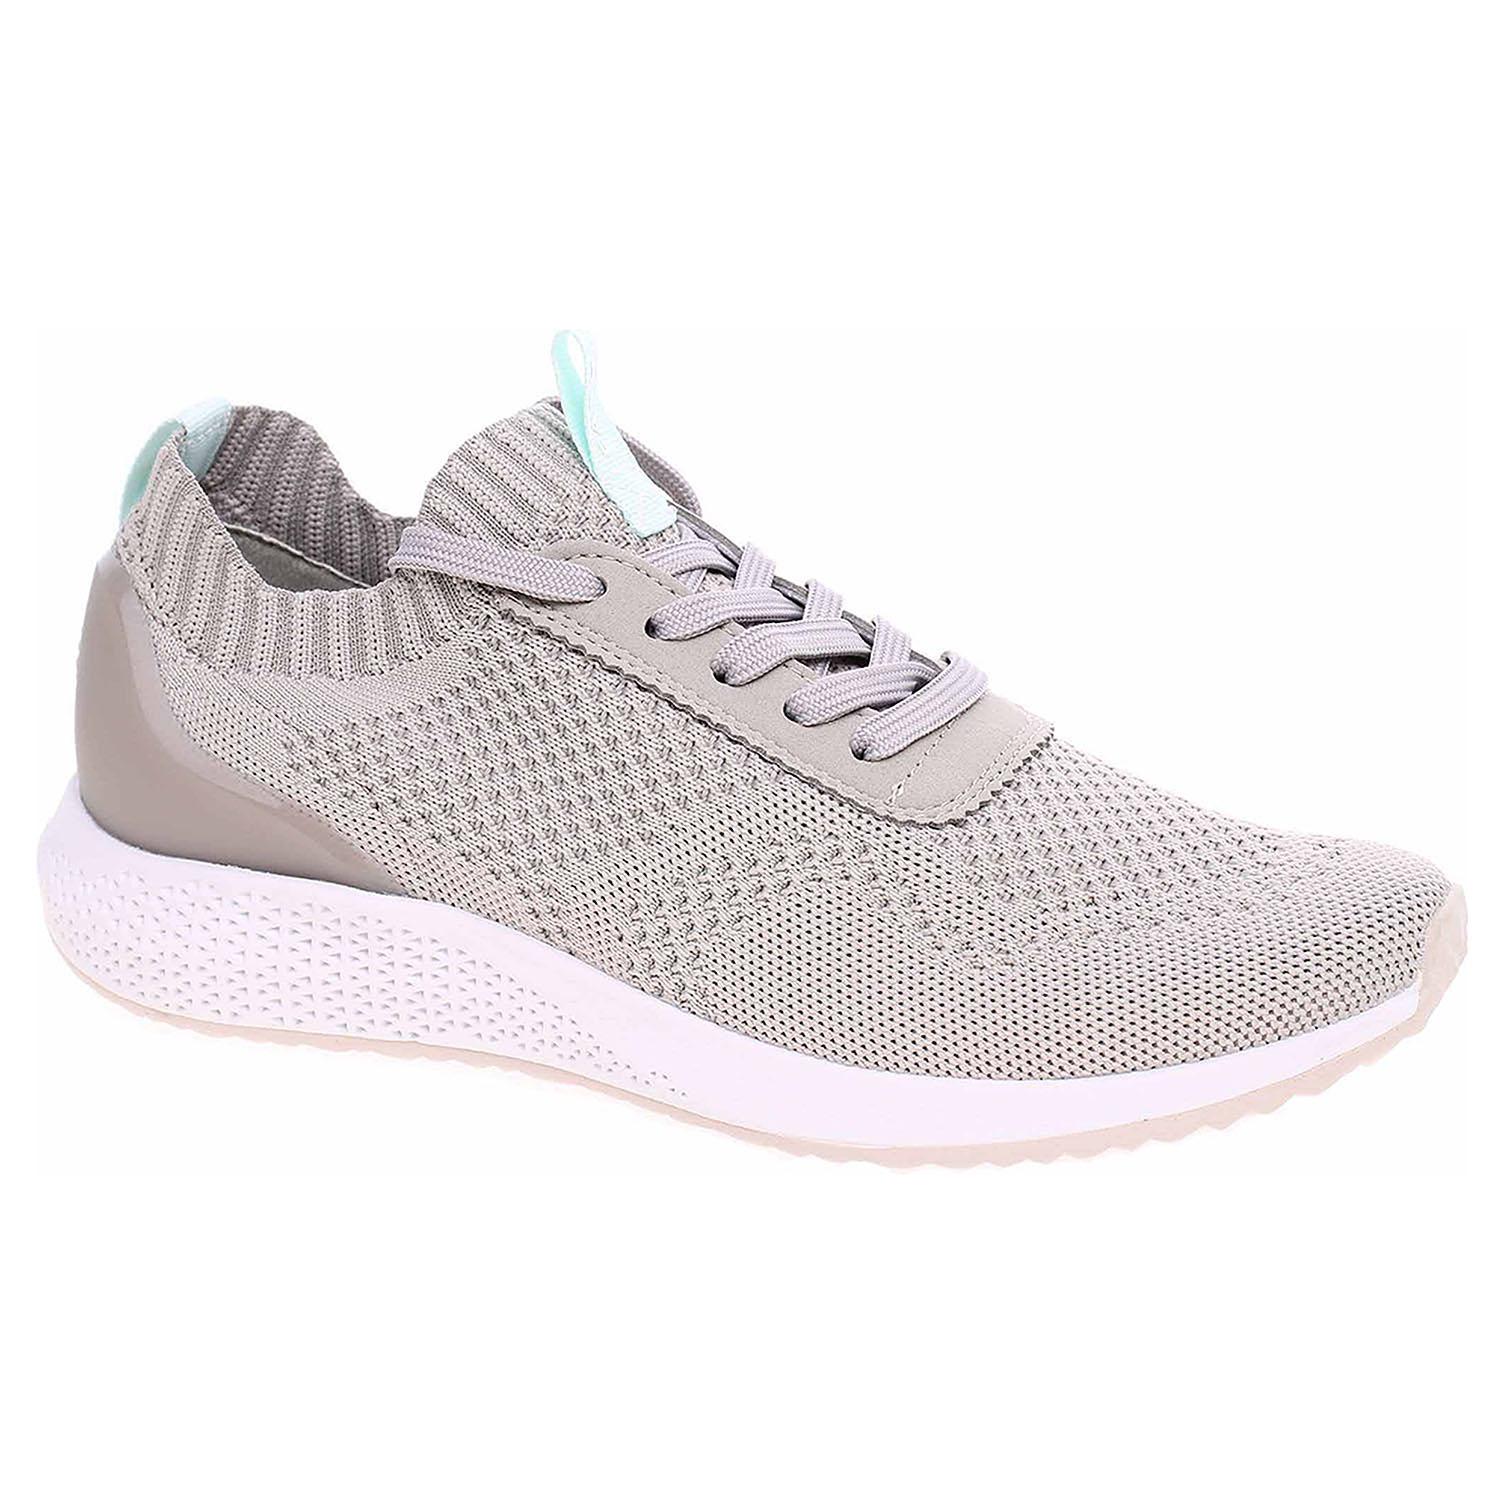 Dámská obuv Tamaris 1-23714-22 stone 1-1-23714-22 205 39